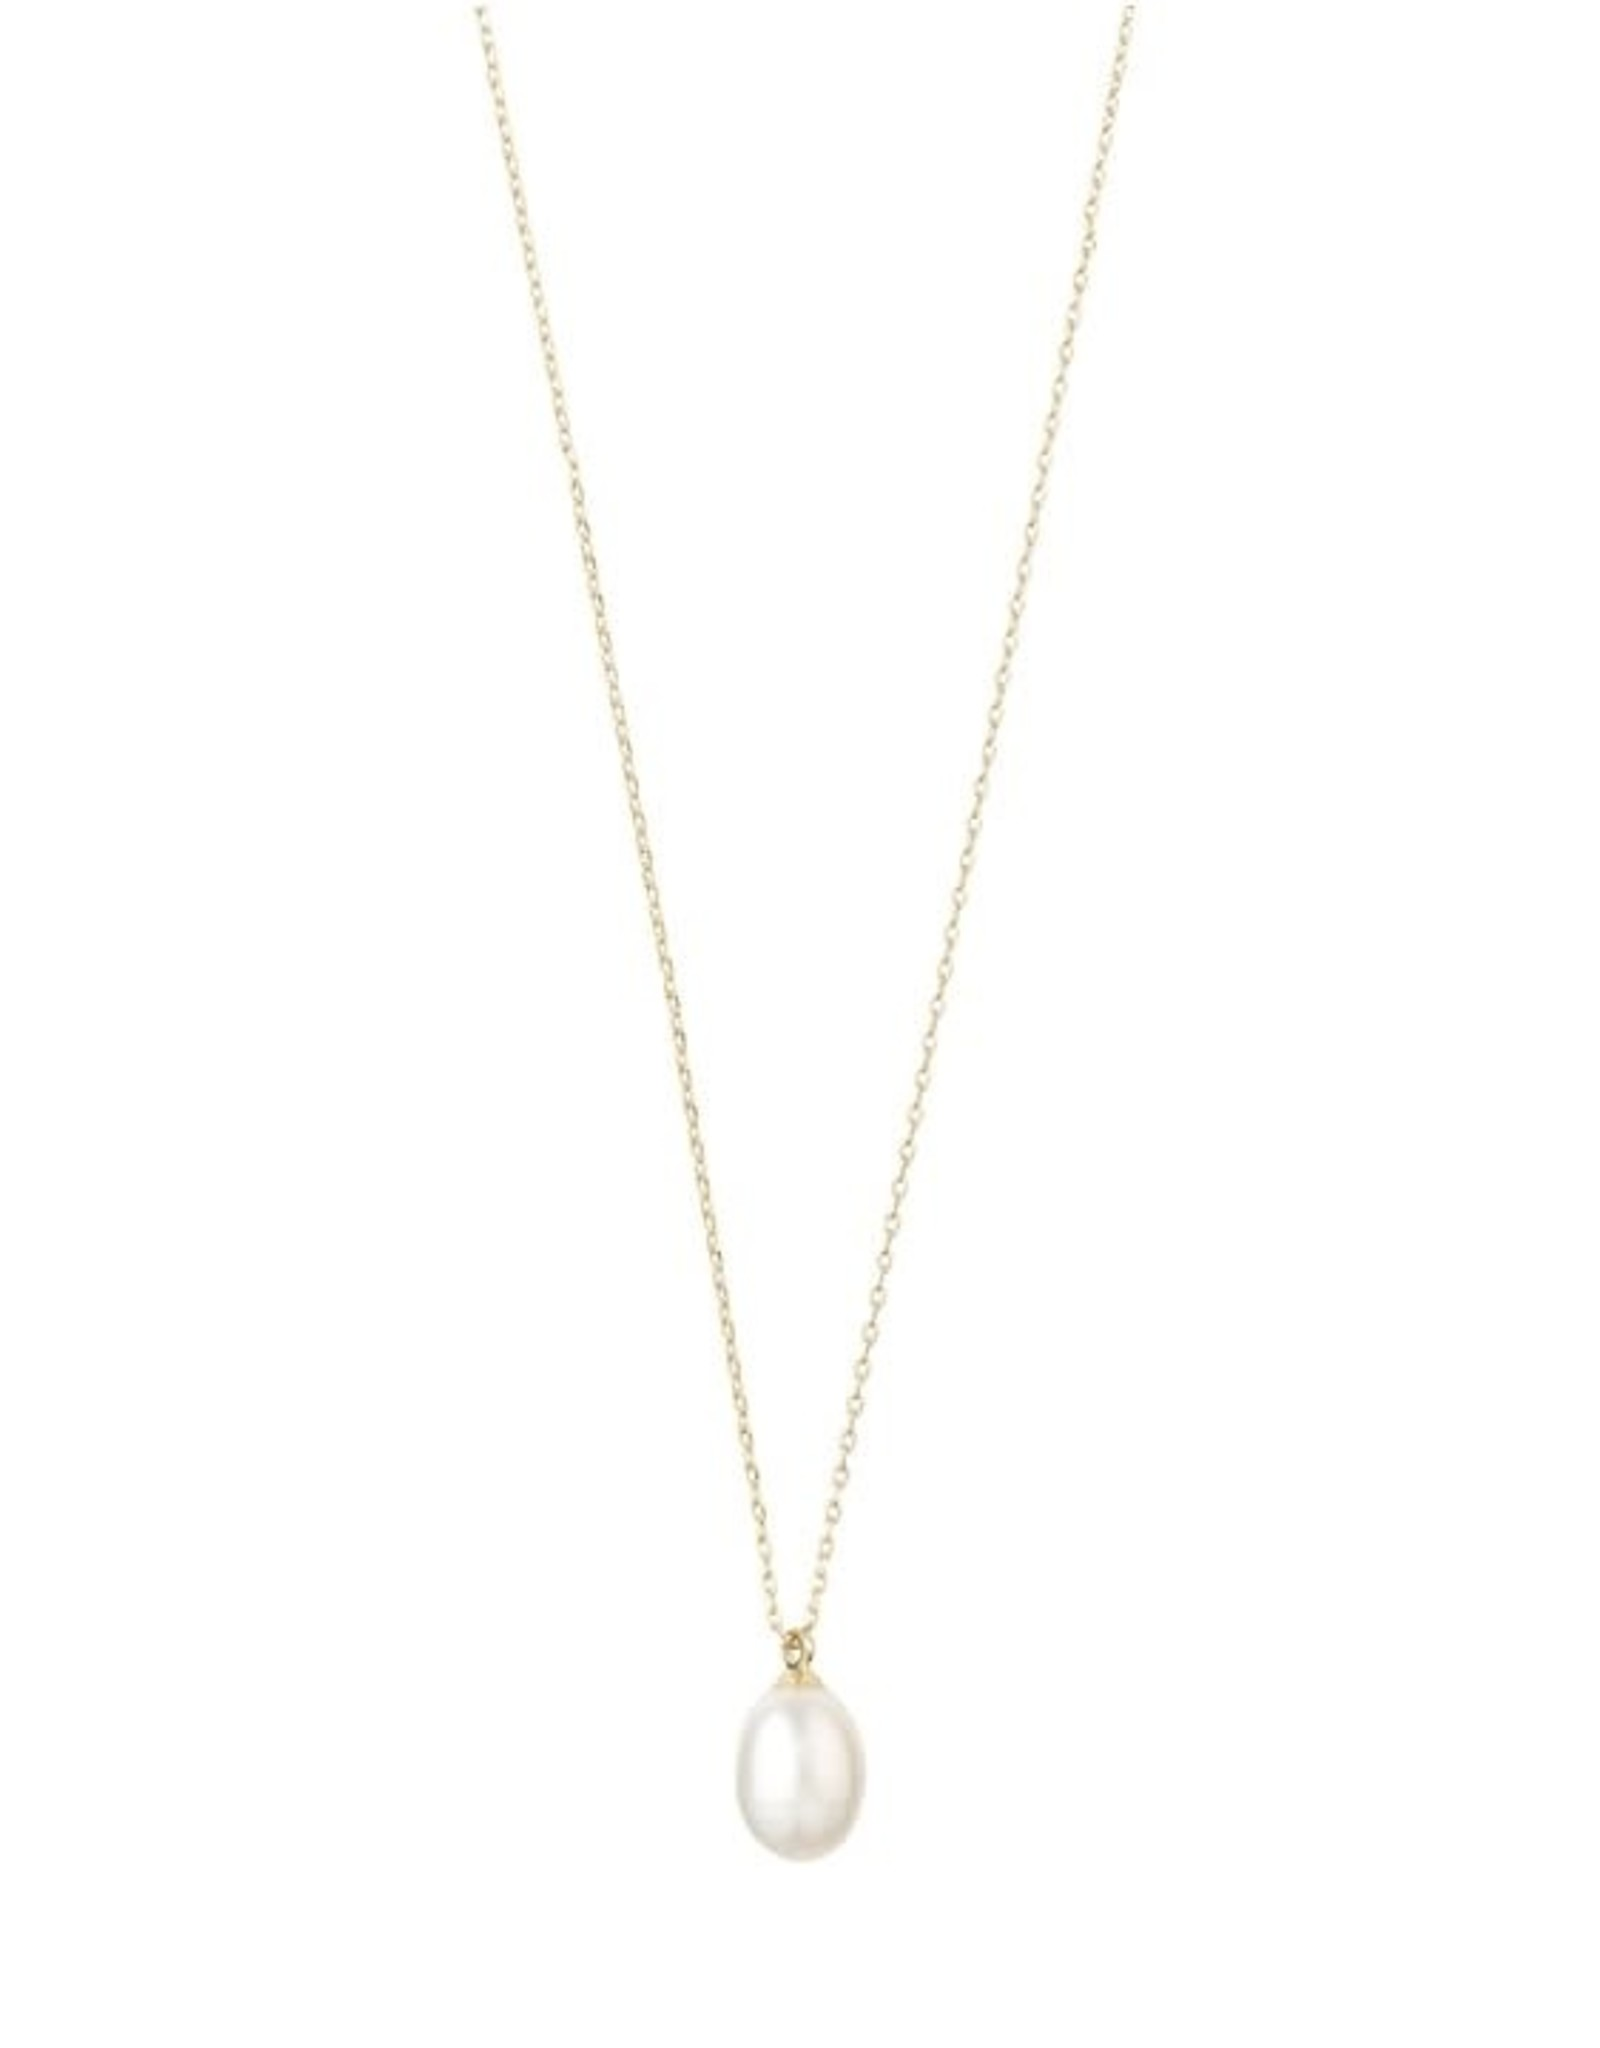 Pilgrim Collier perle blanche - Or